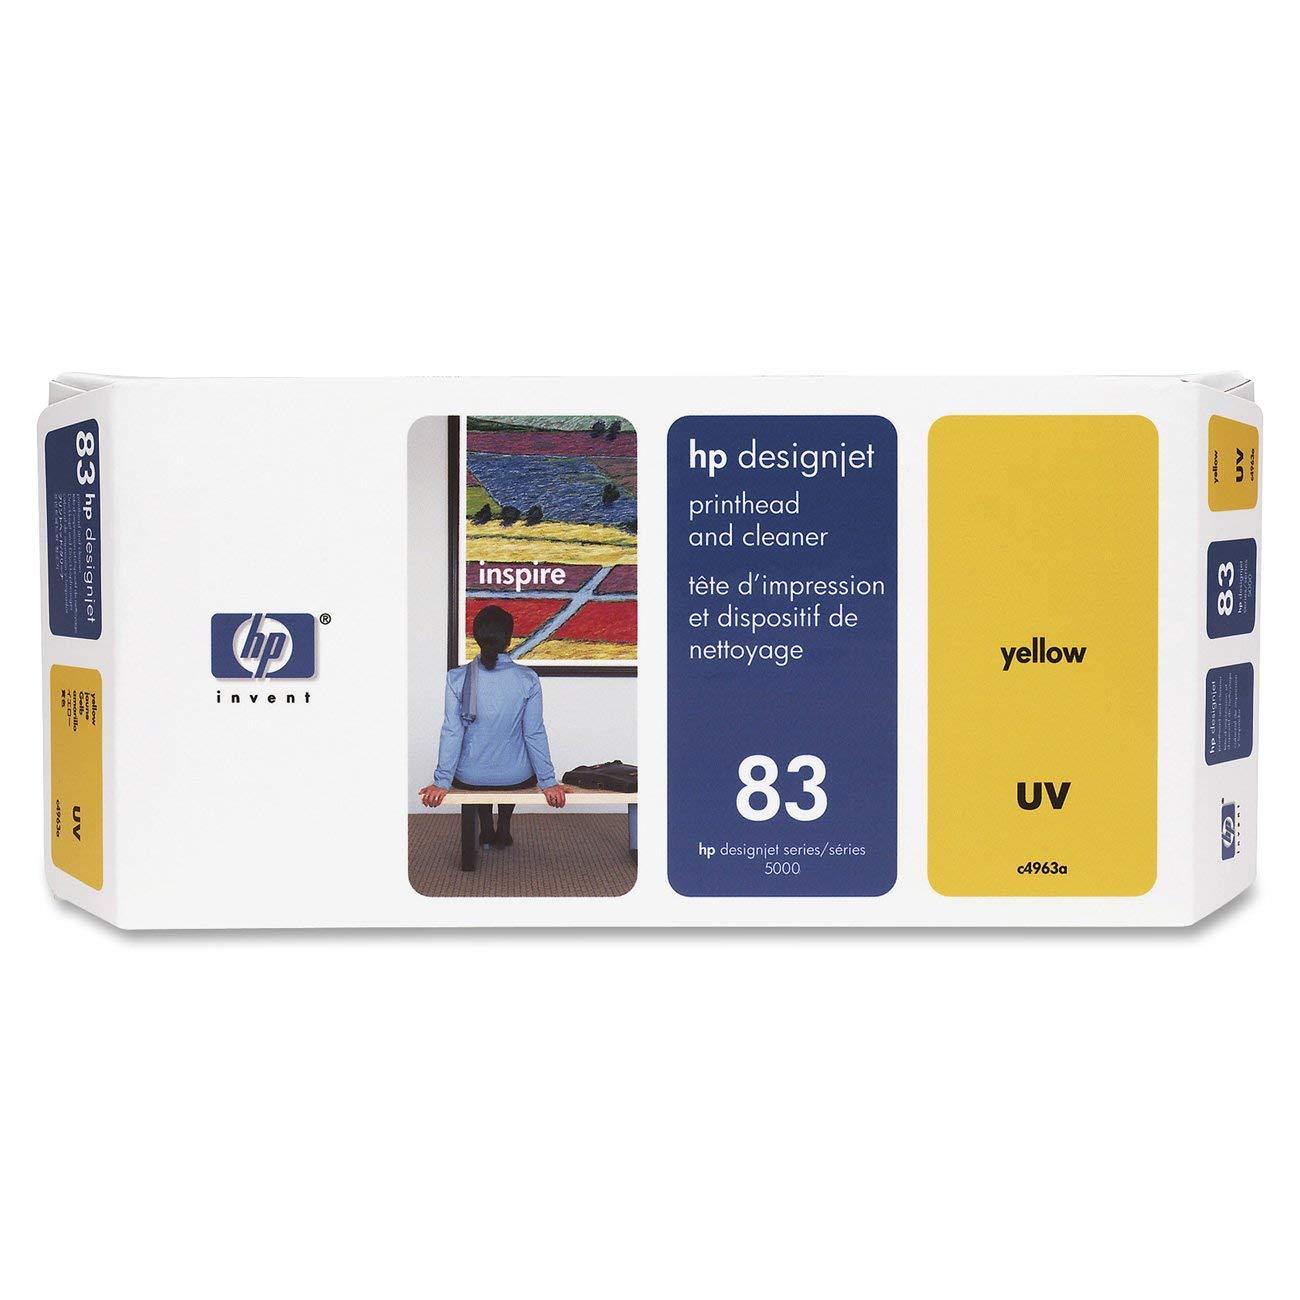 Original Printer Head for HP 83 C4963A UV Printhead and Cleaner for DesignJet 5000 series, YellowOriginal Printer Head for HP 83 C4963A UV Printhead and Cleaner for DesignJet 5000 series, Yellow